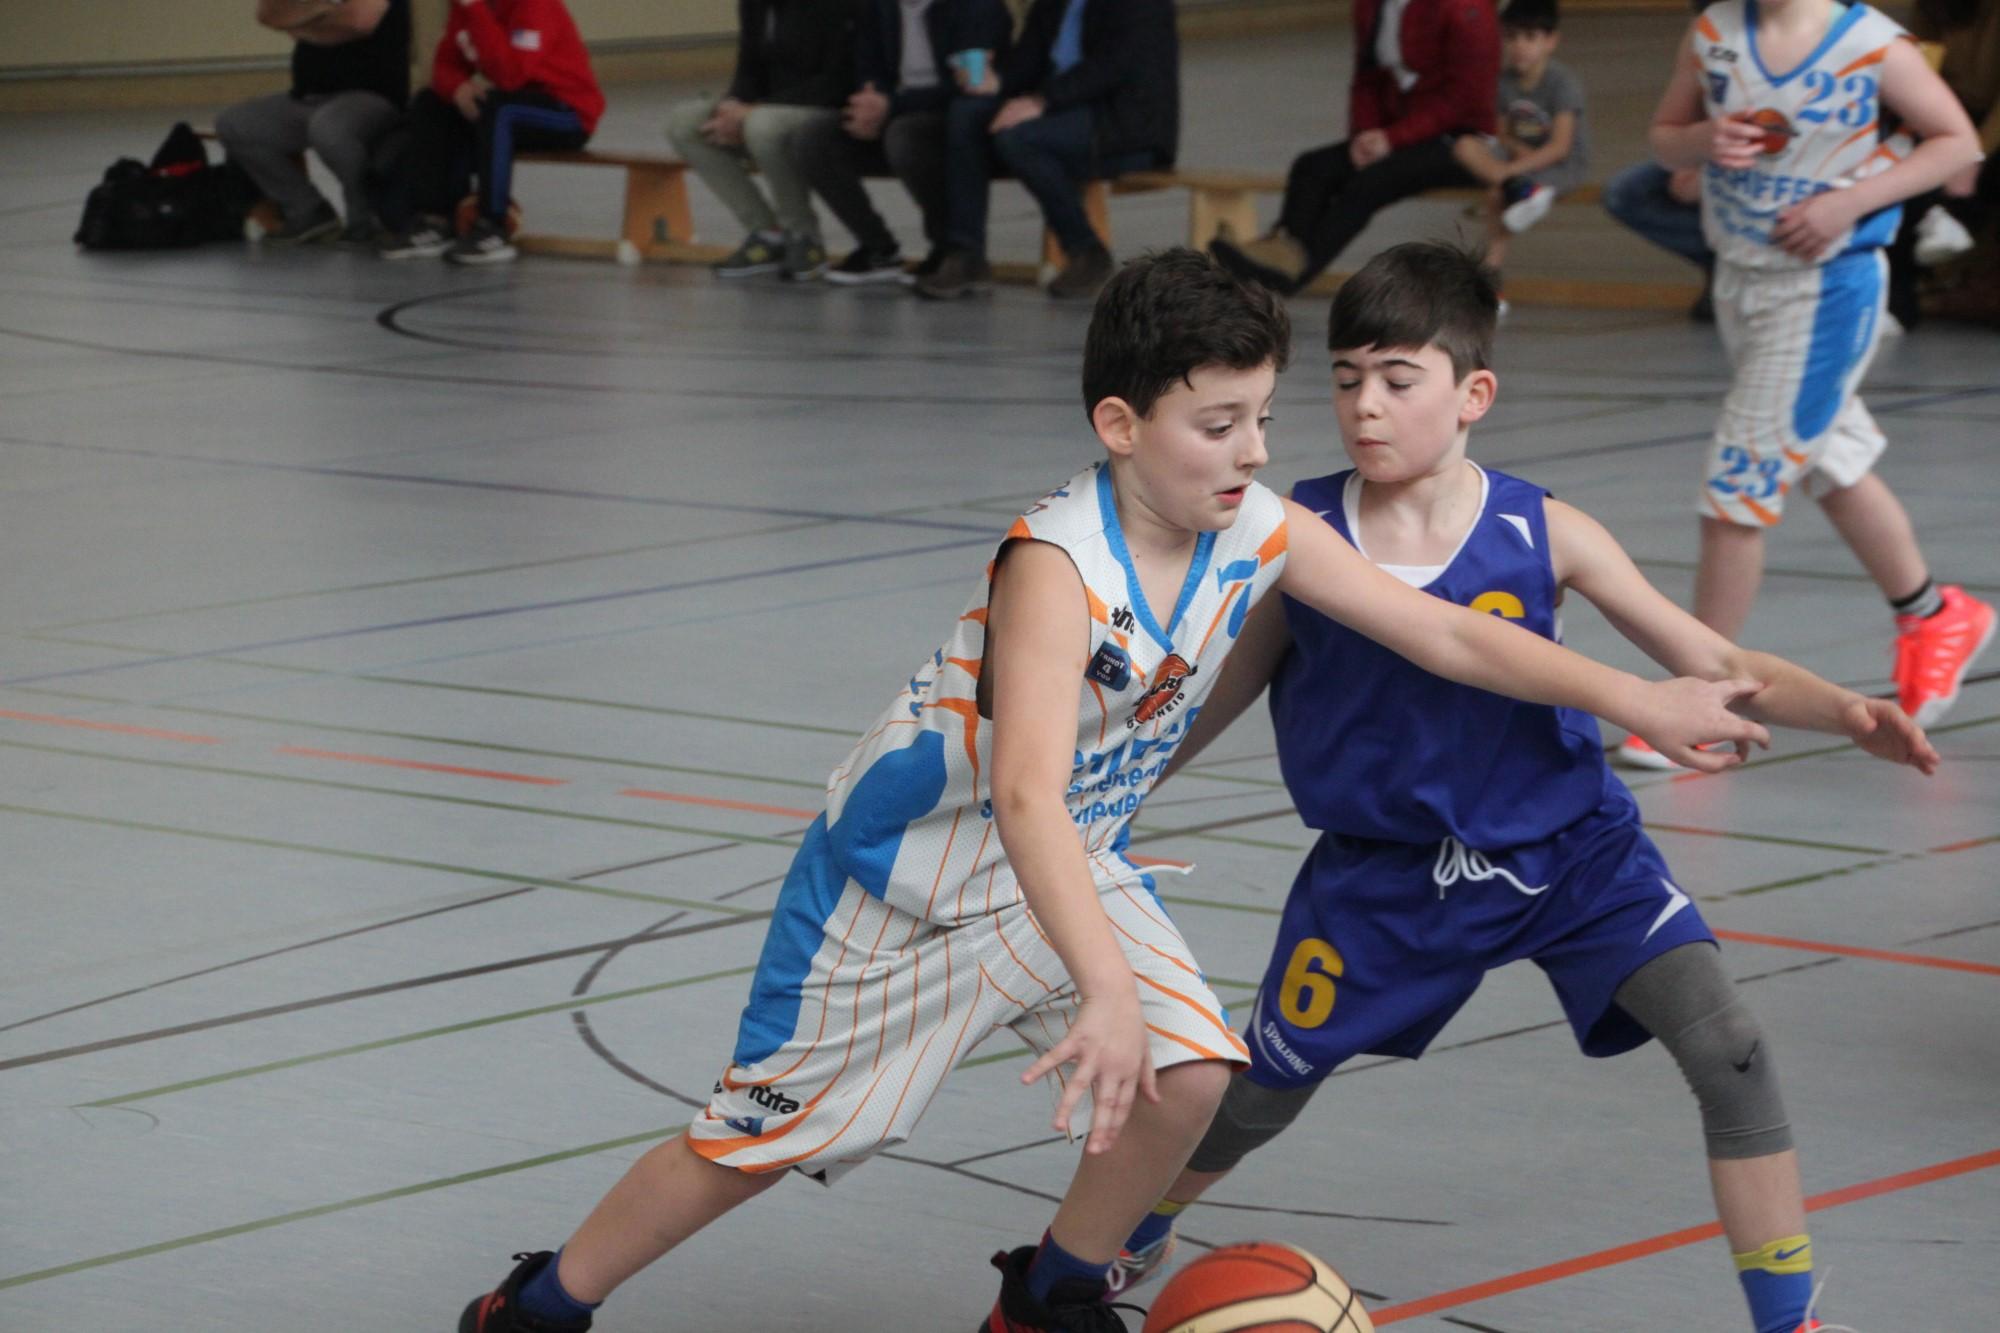 U12-Oberliga: Bärenstarke Defense in zweiter Hälfte